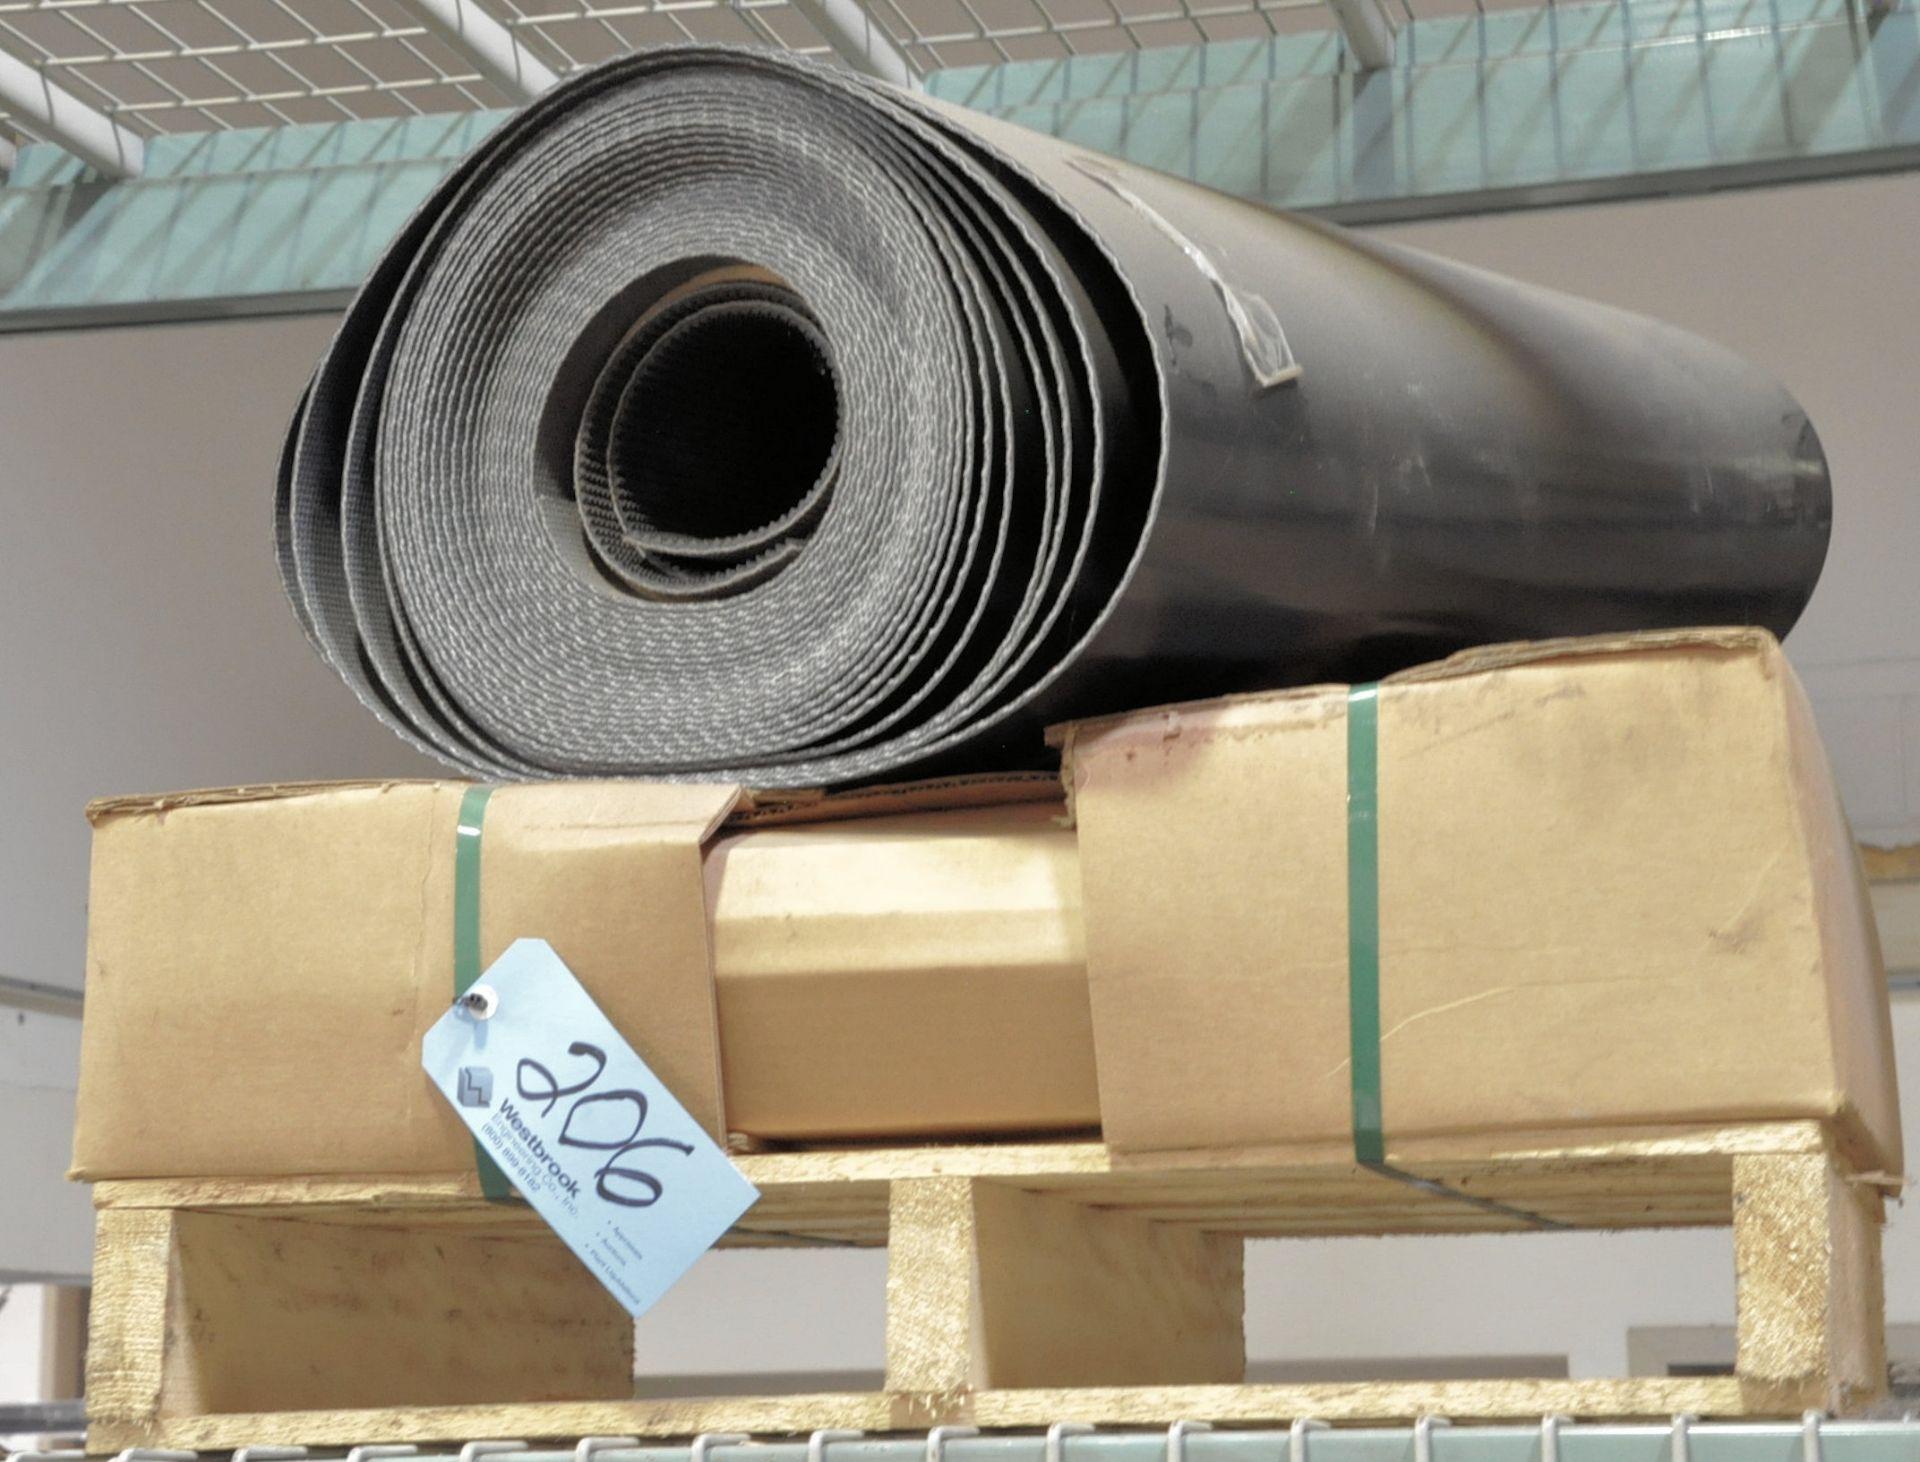 Lot 206 - Lot-Conveyor Belt Materials on (1) Pallet